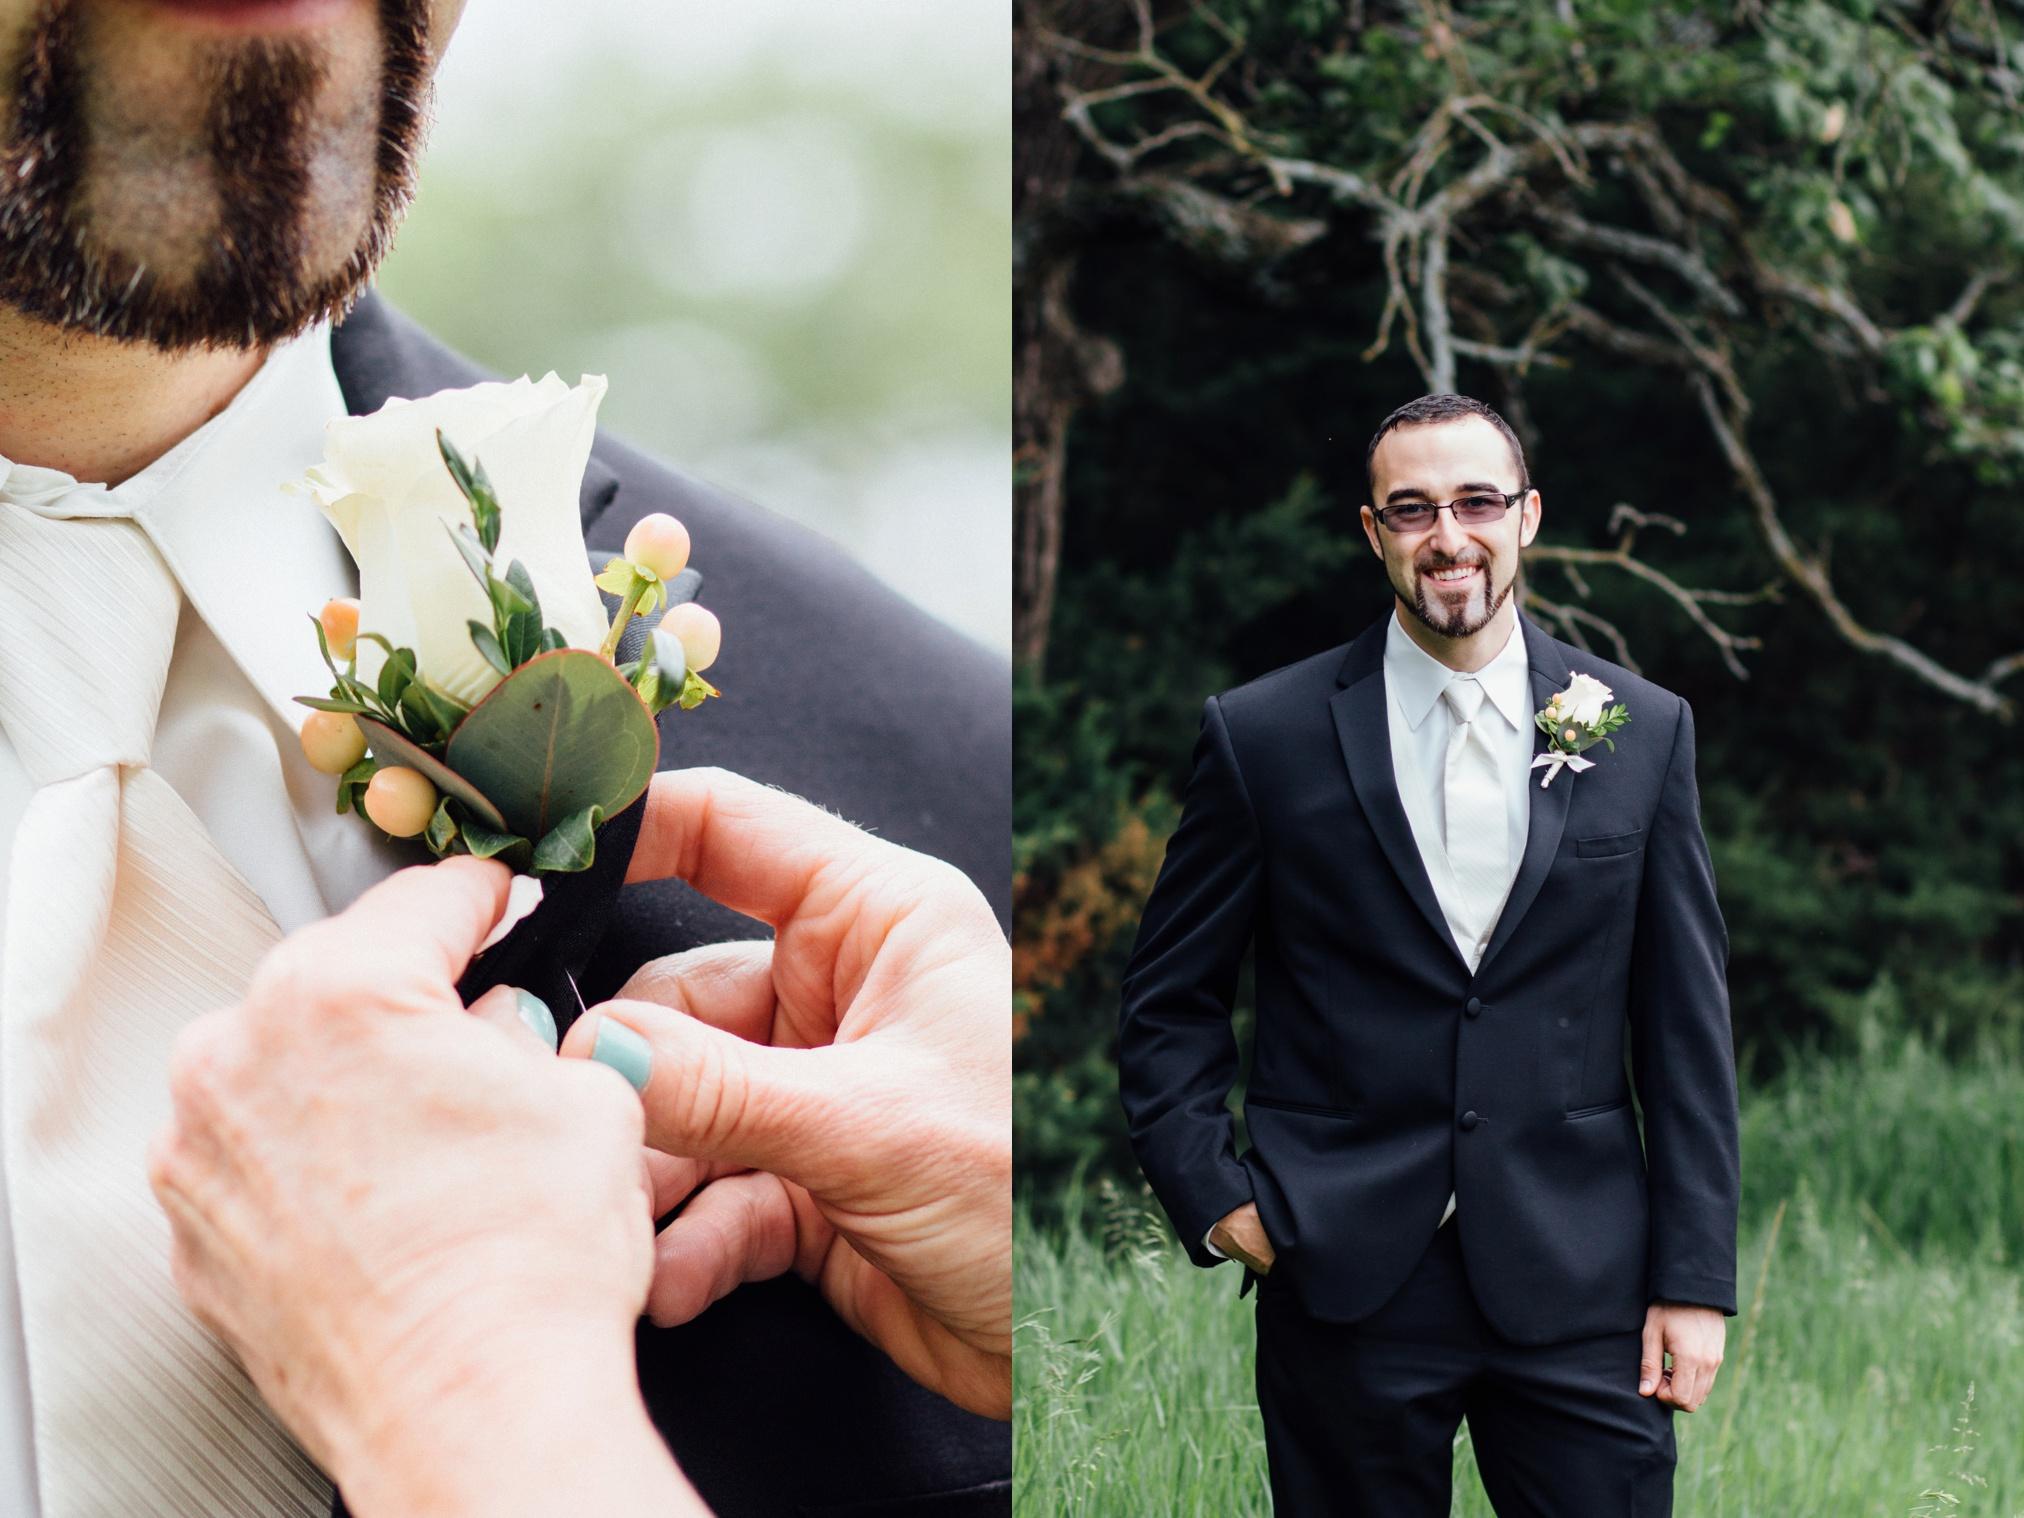 schmid_wedding-165.jpg